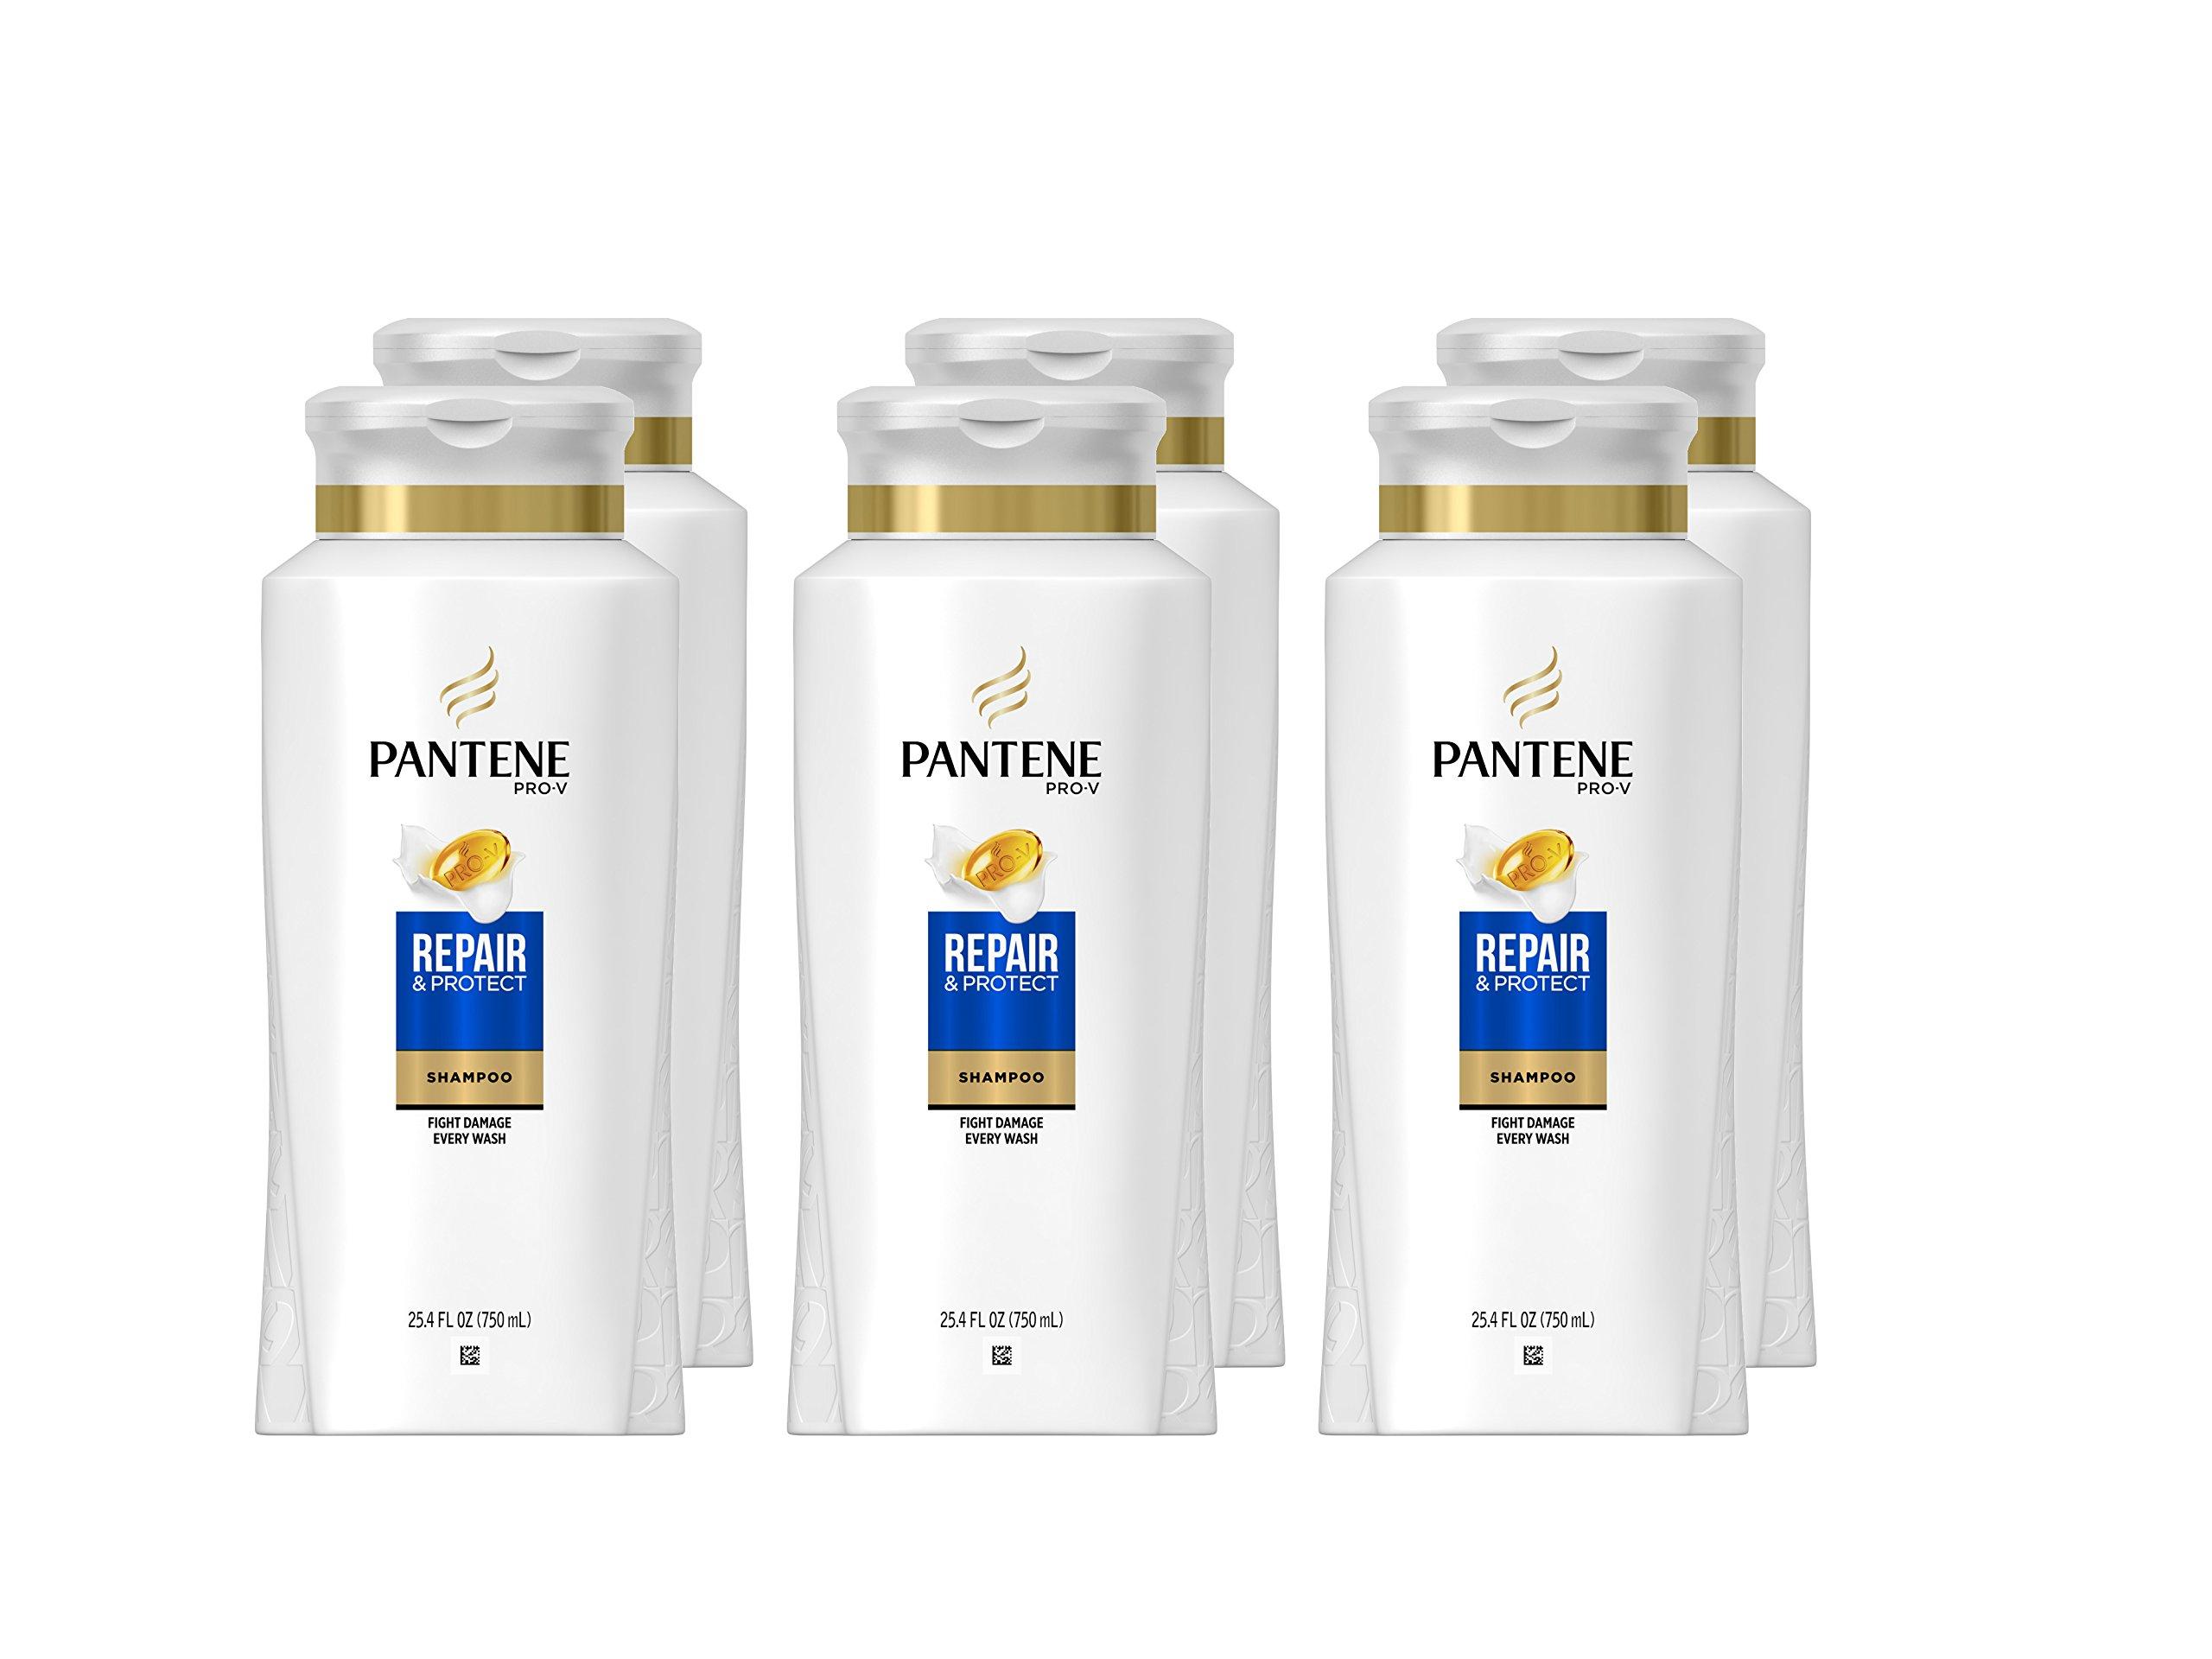 Pantene Pro-V Repair & Protect Shampoo, 25.4 fl oz by Pantene